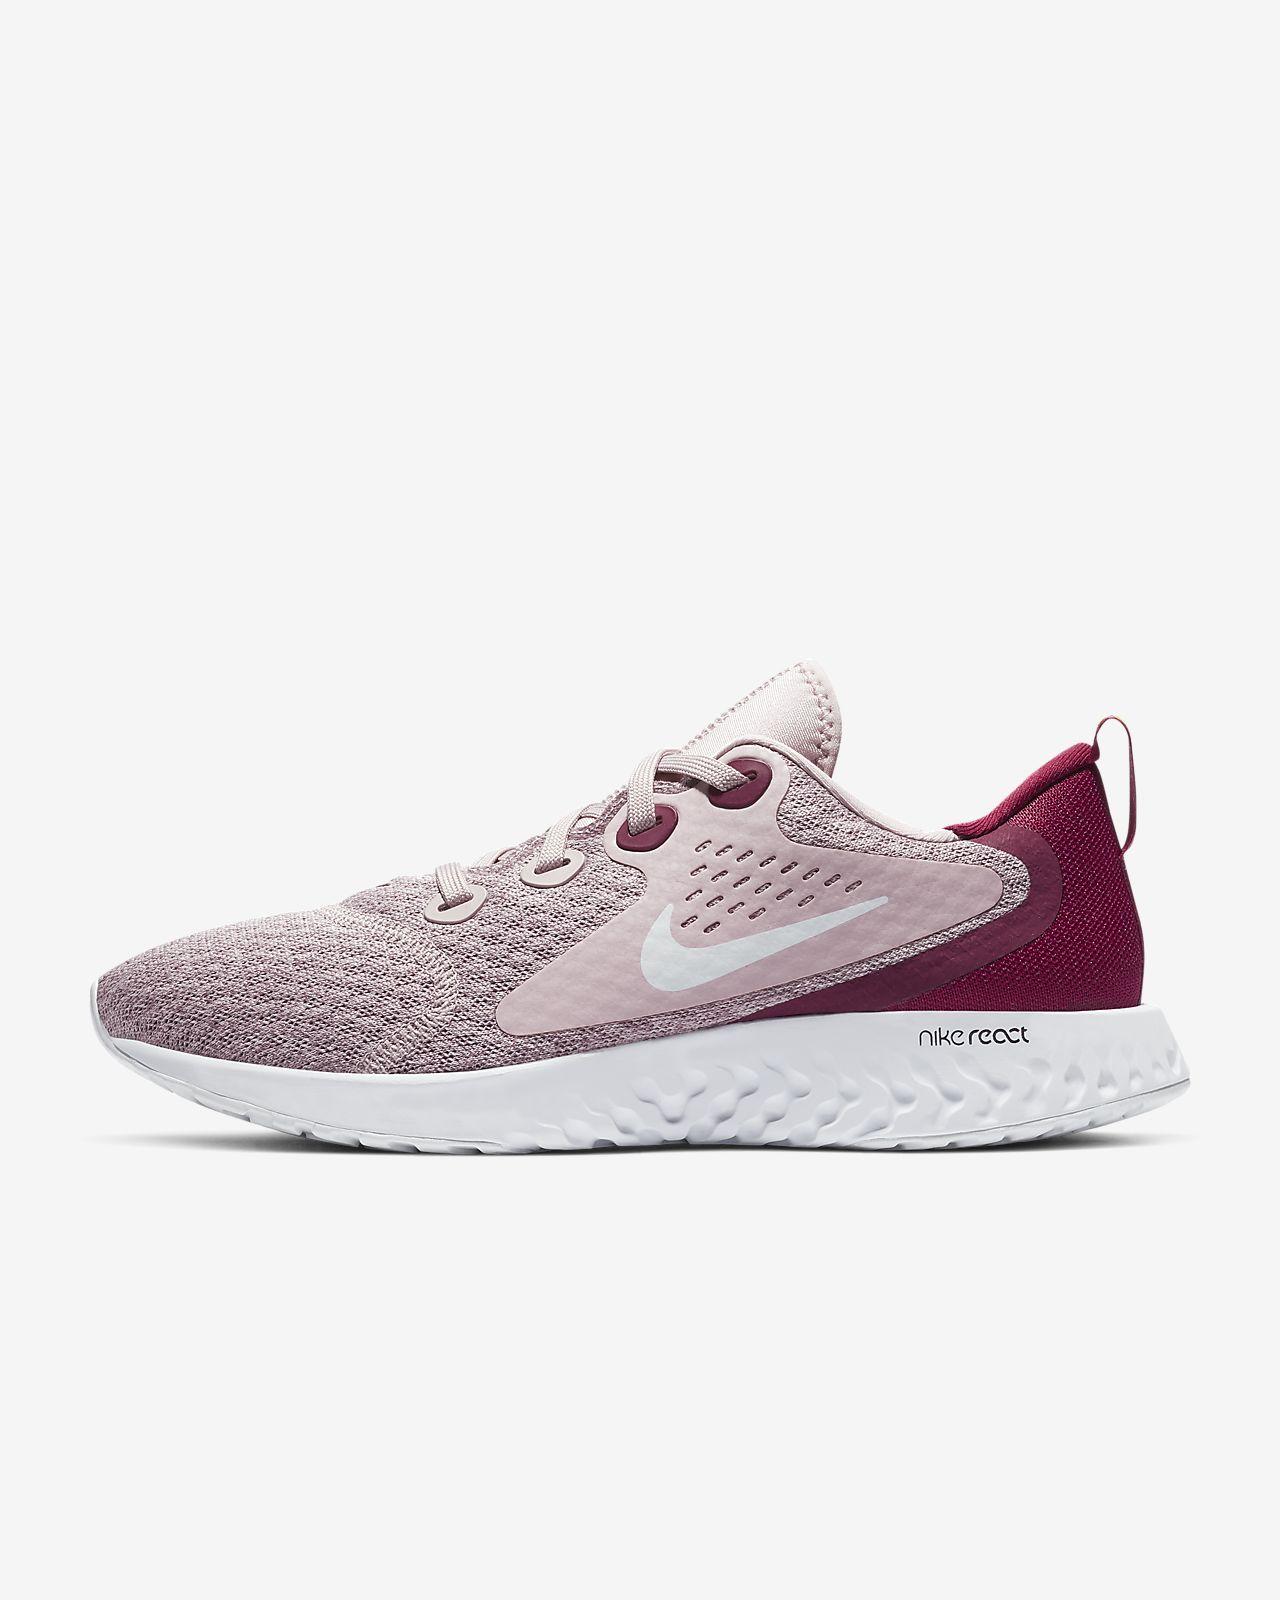 san francisco 4f8db b0036 ... Chaussure de running Nike Legend React pour Femme